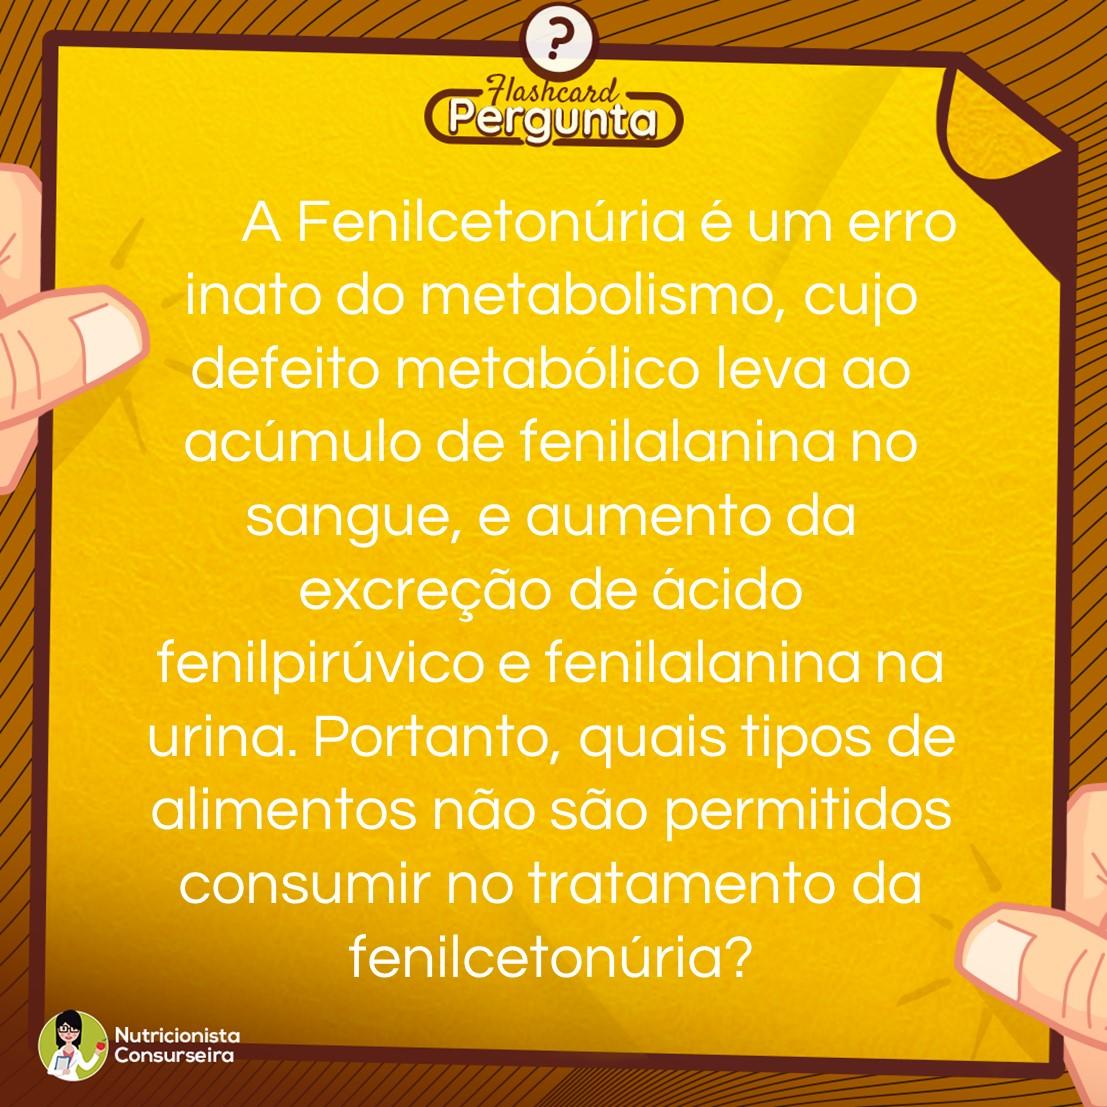 Flashcard de Fenilcetonúria